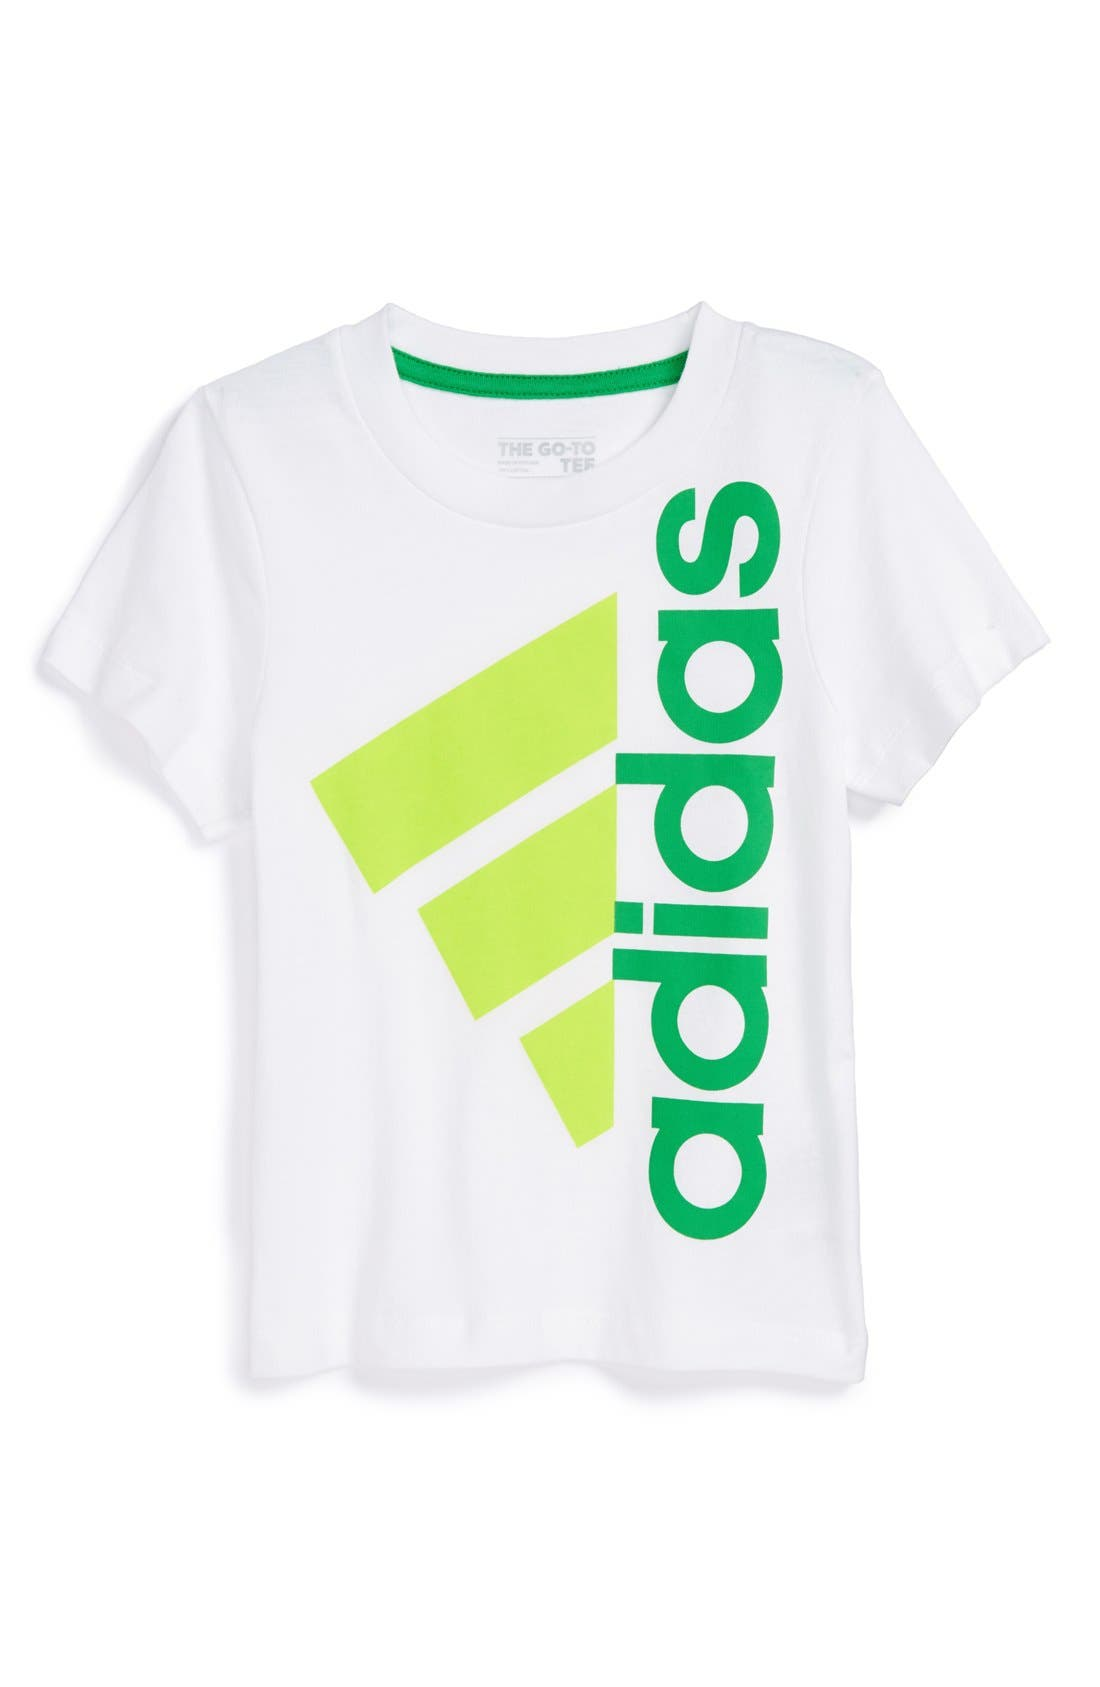 Main Image - adidas 'Bold Performance' T-Shirt (Toddler Boys)